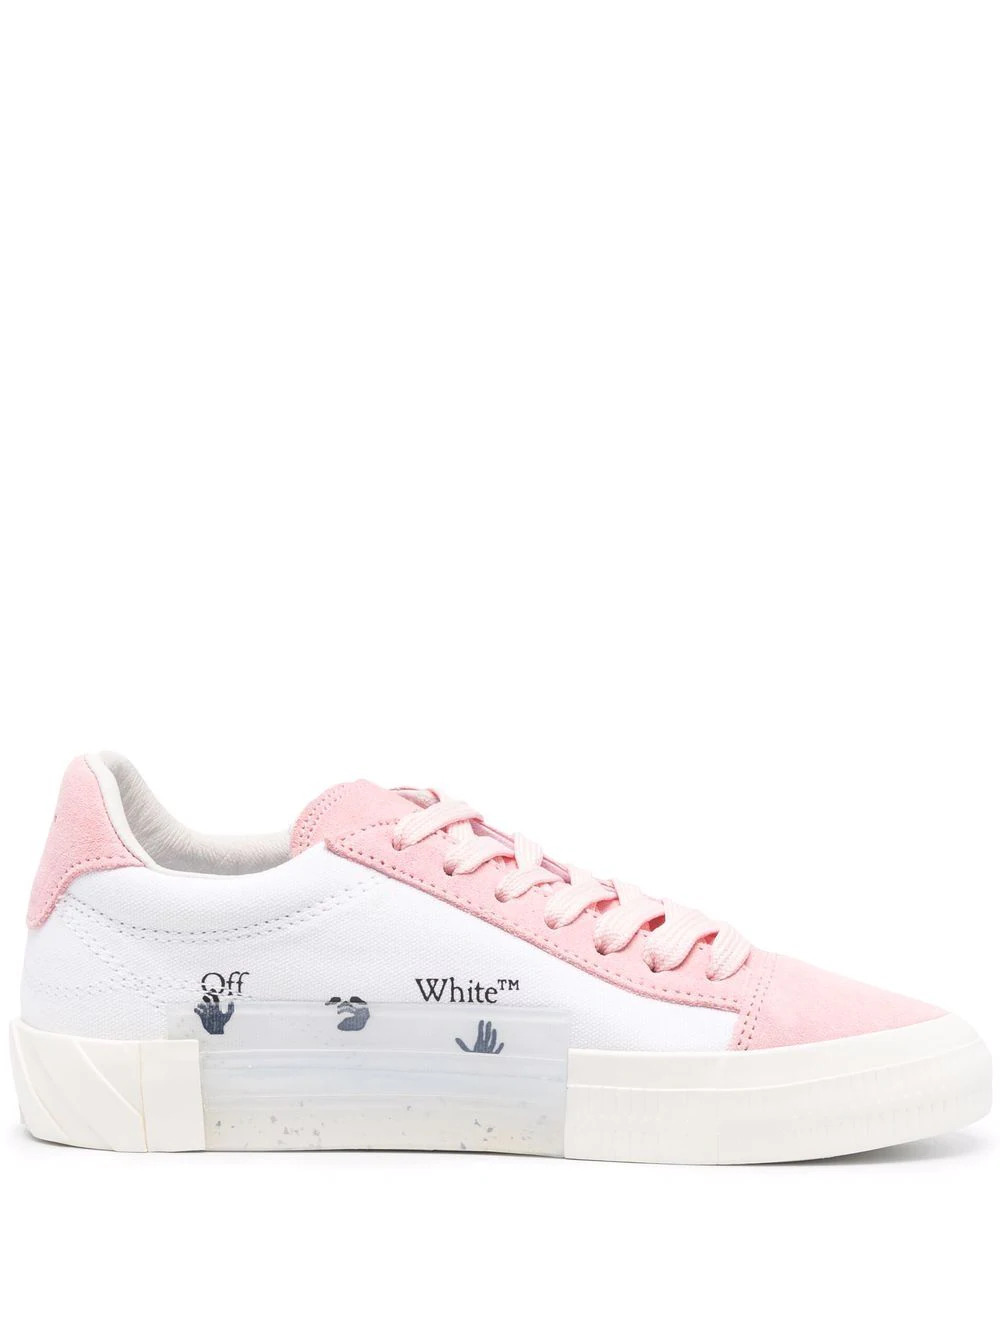 Low-Top Vulcanized Sneakers in Rosa